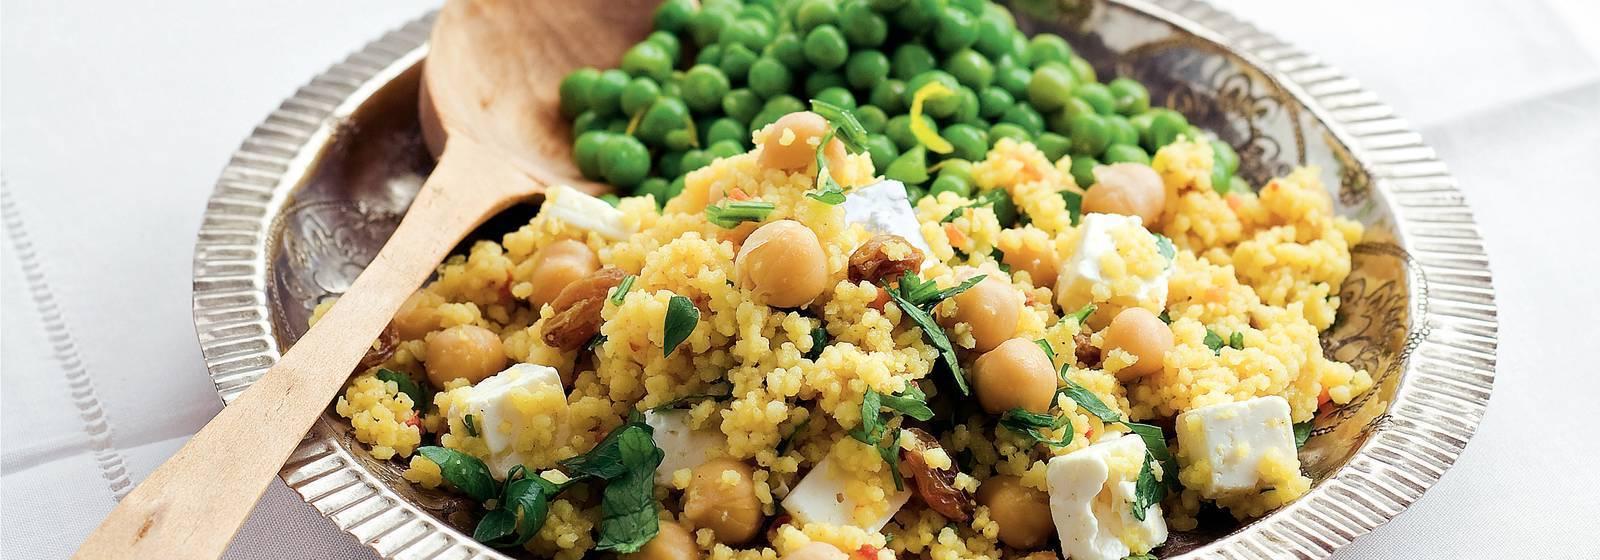 Couscous with garden peas